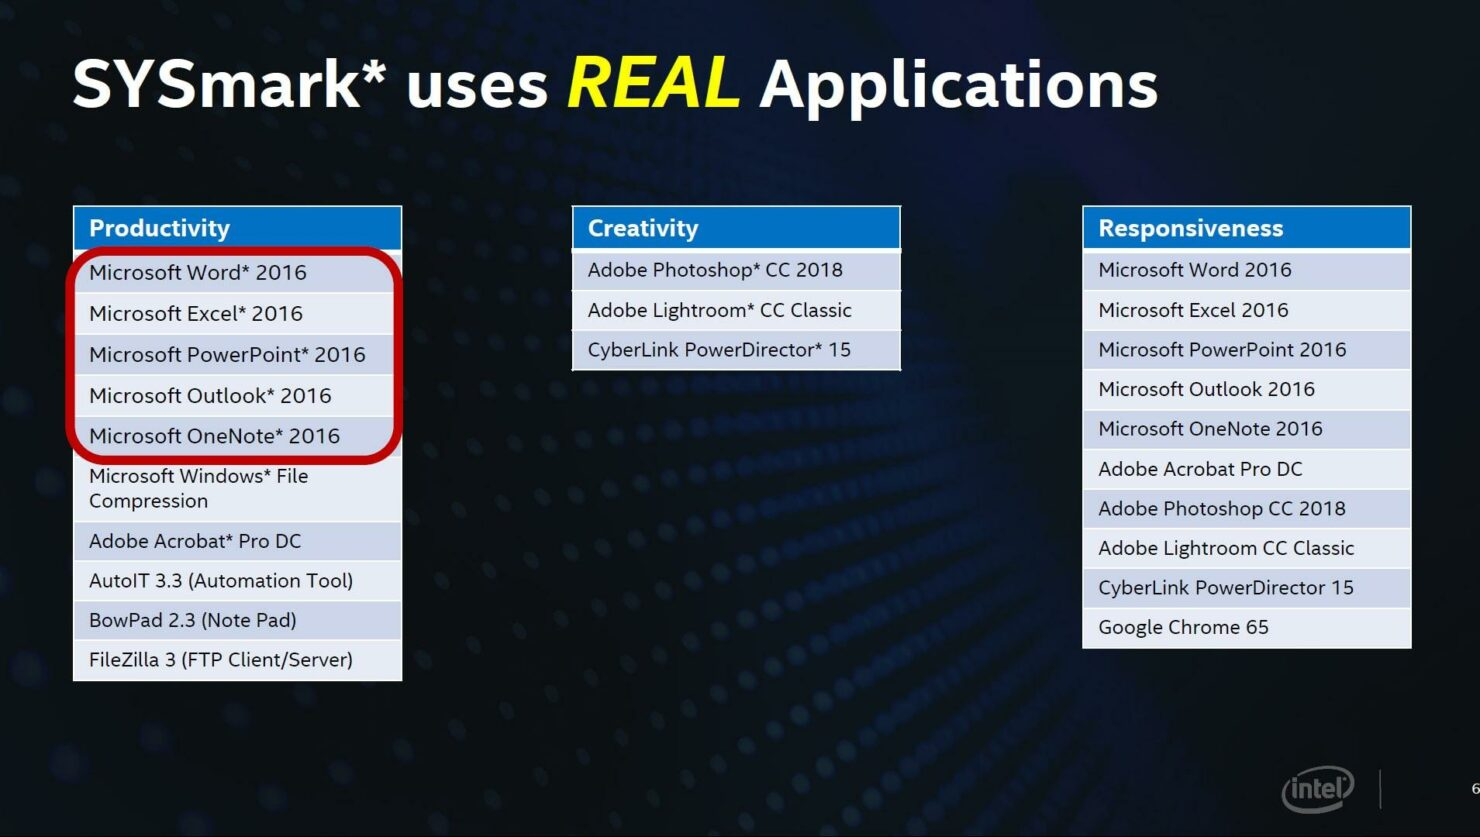 intel-real-usage-performance-tests_9th-gen-intel-core-vs-amd-ryzen-3000-cpus_3